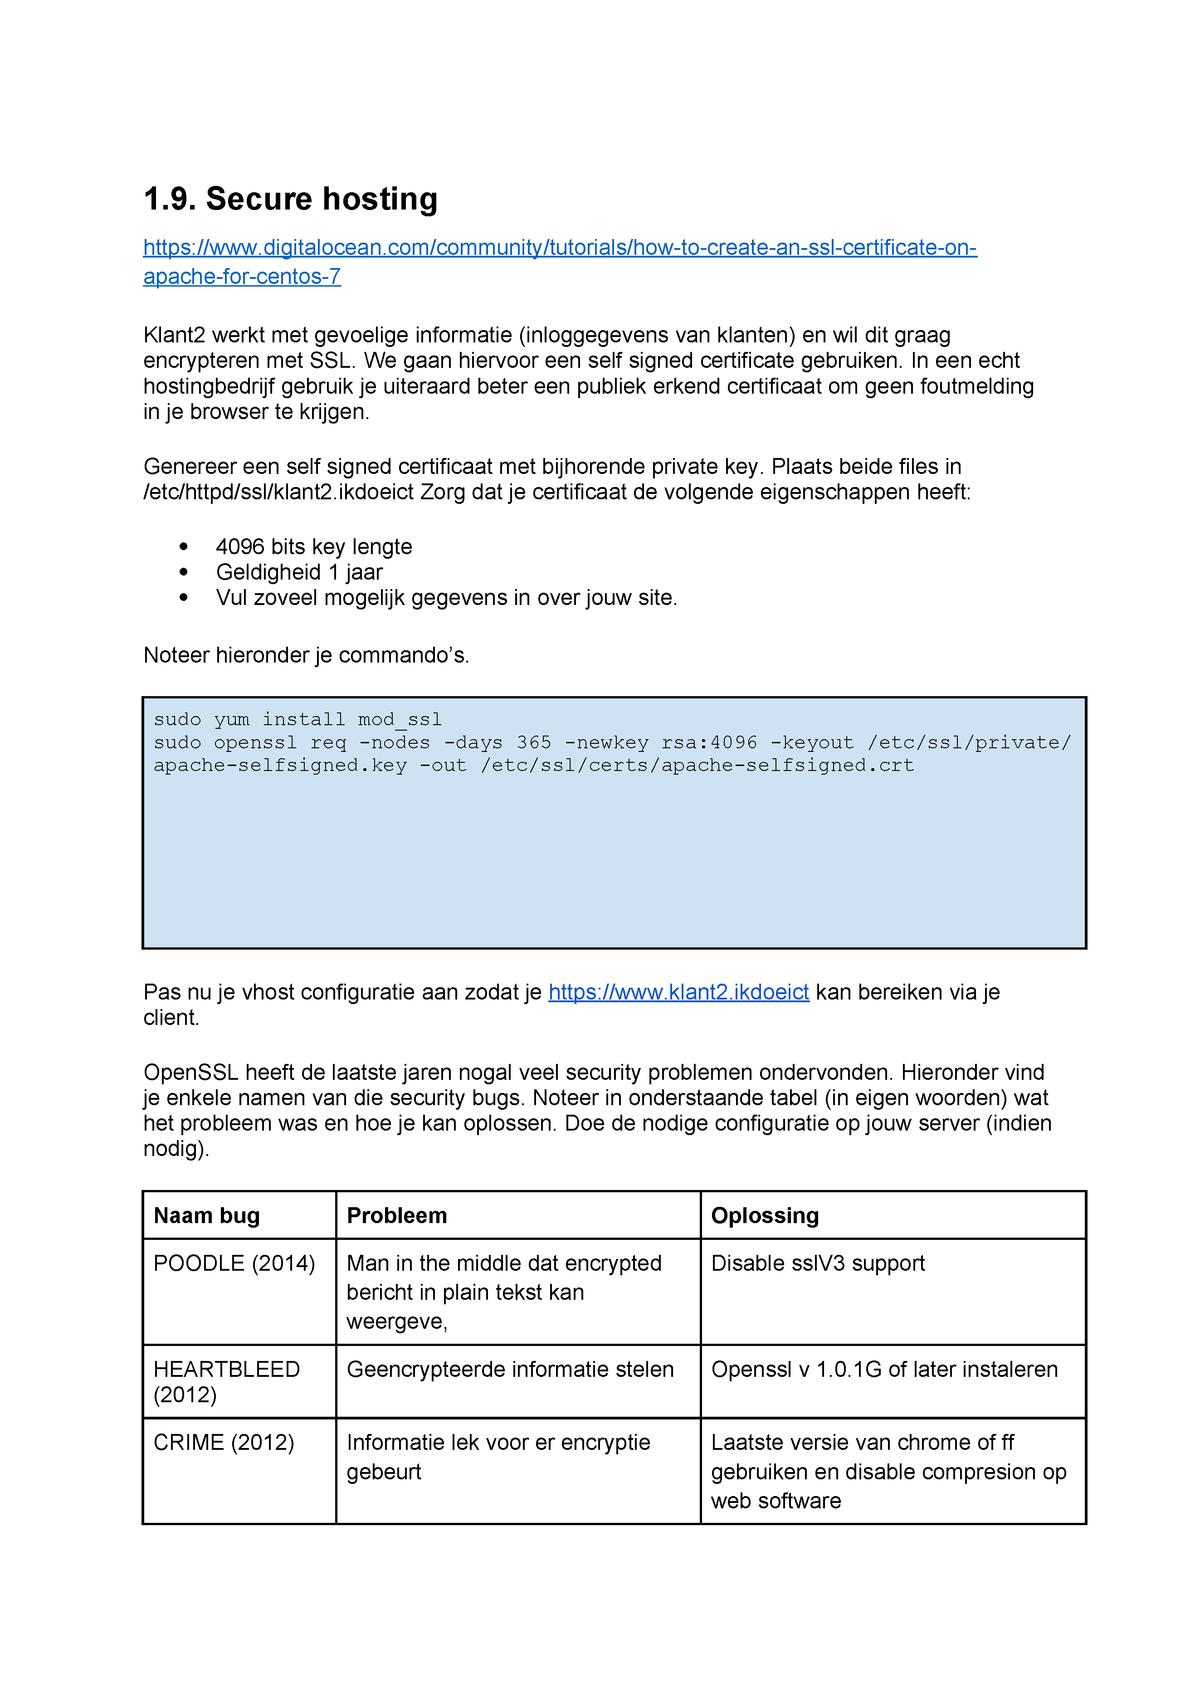 Labo 9 - Secure hosting - JPW339: Server Administration - StuDocu